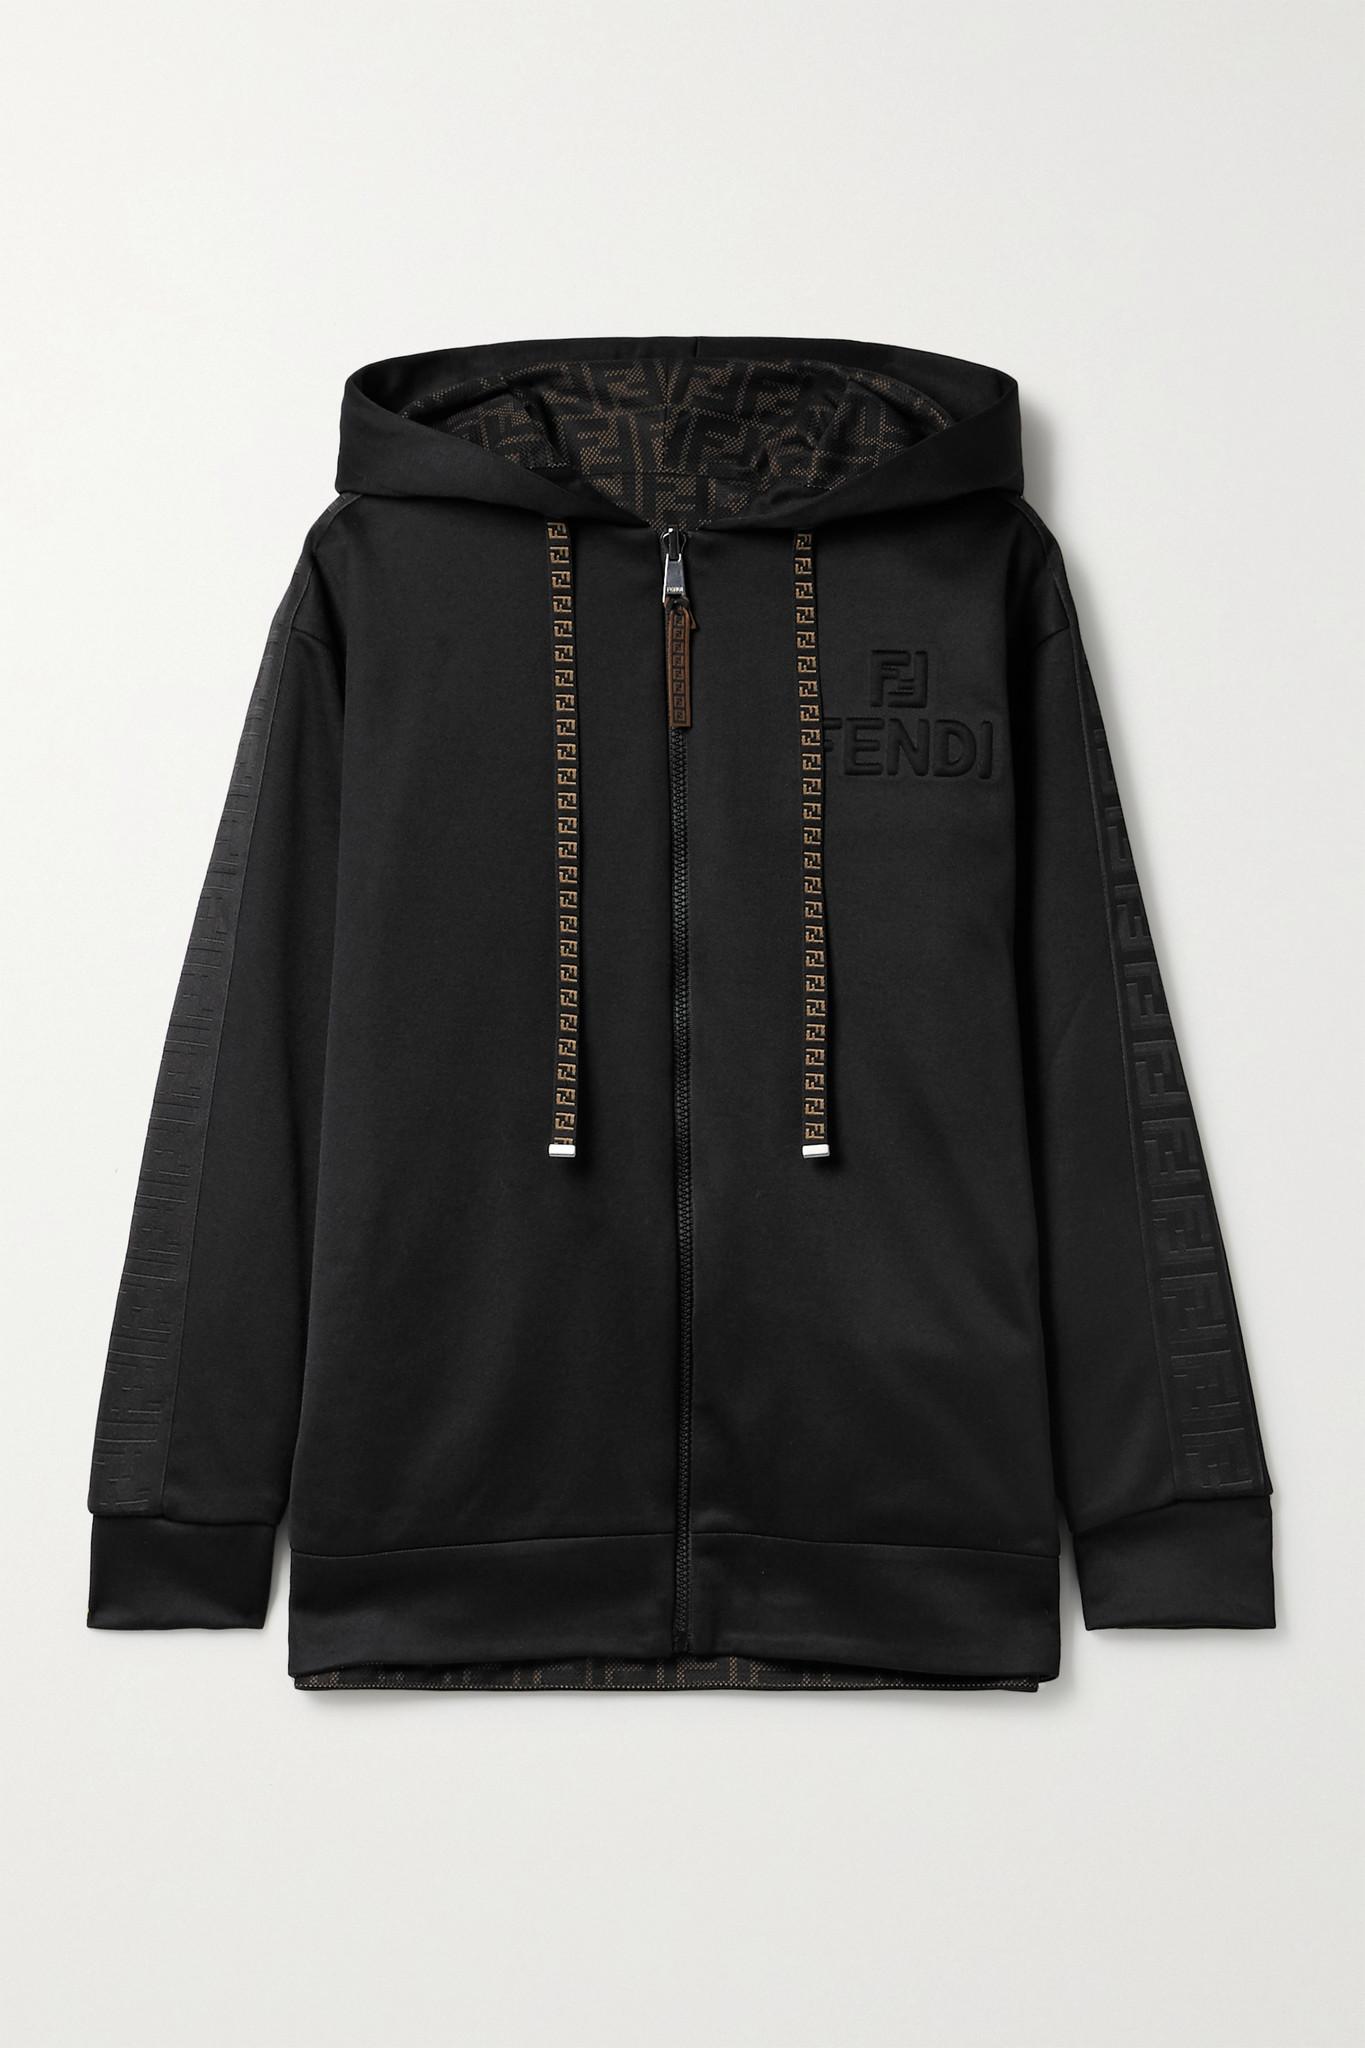 FENDI - Reversible Tech-jersey And Printed Mesh Hoodie - Black - small